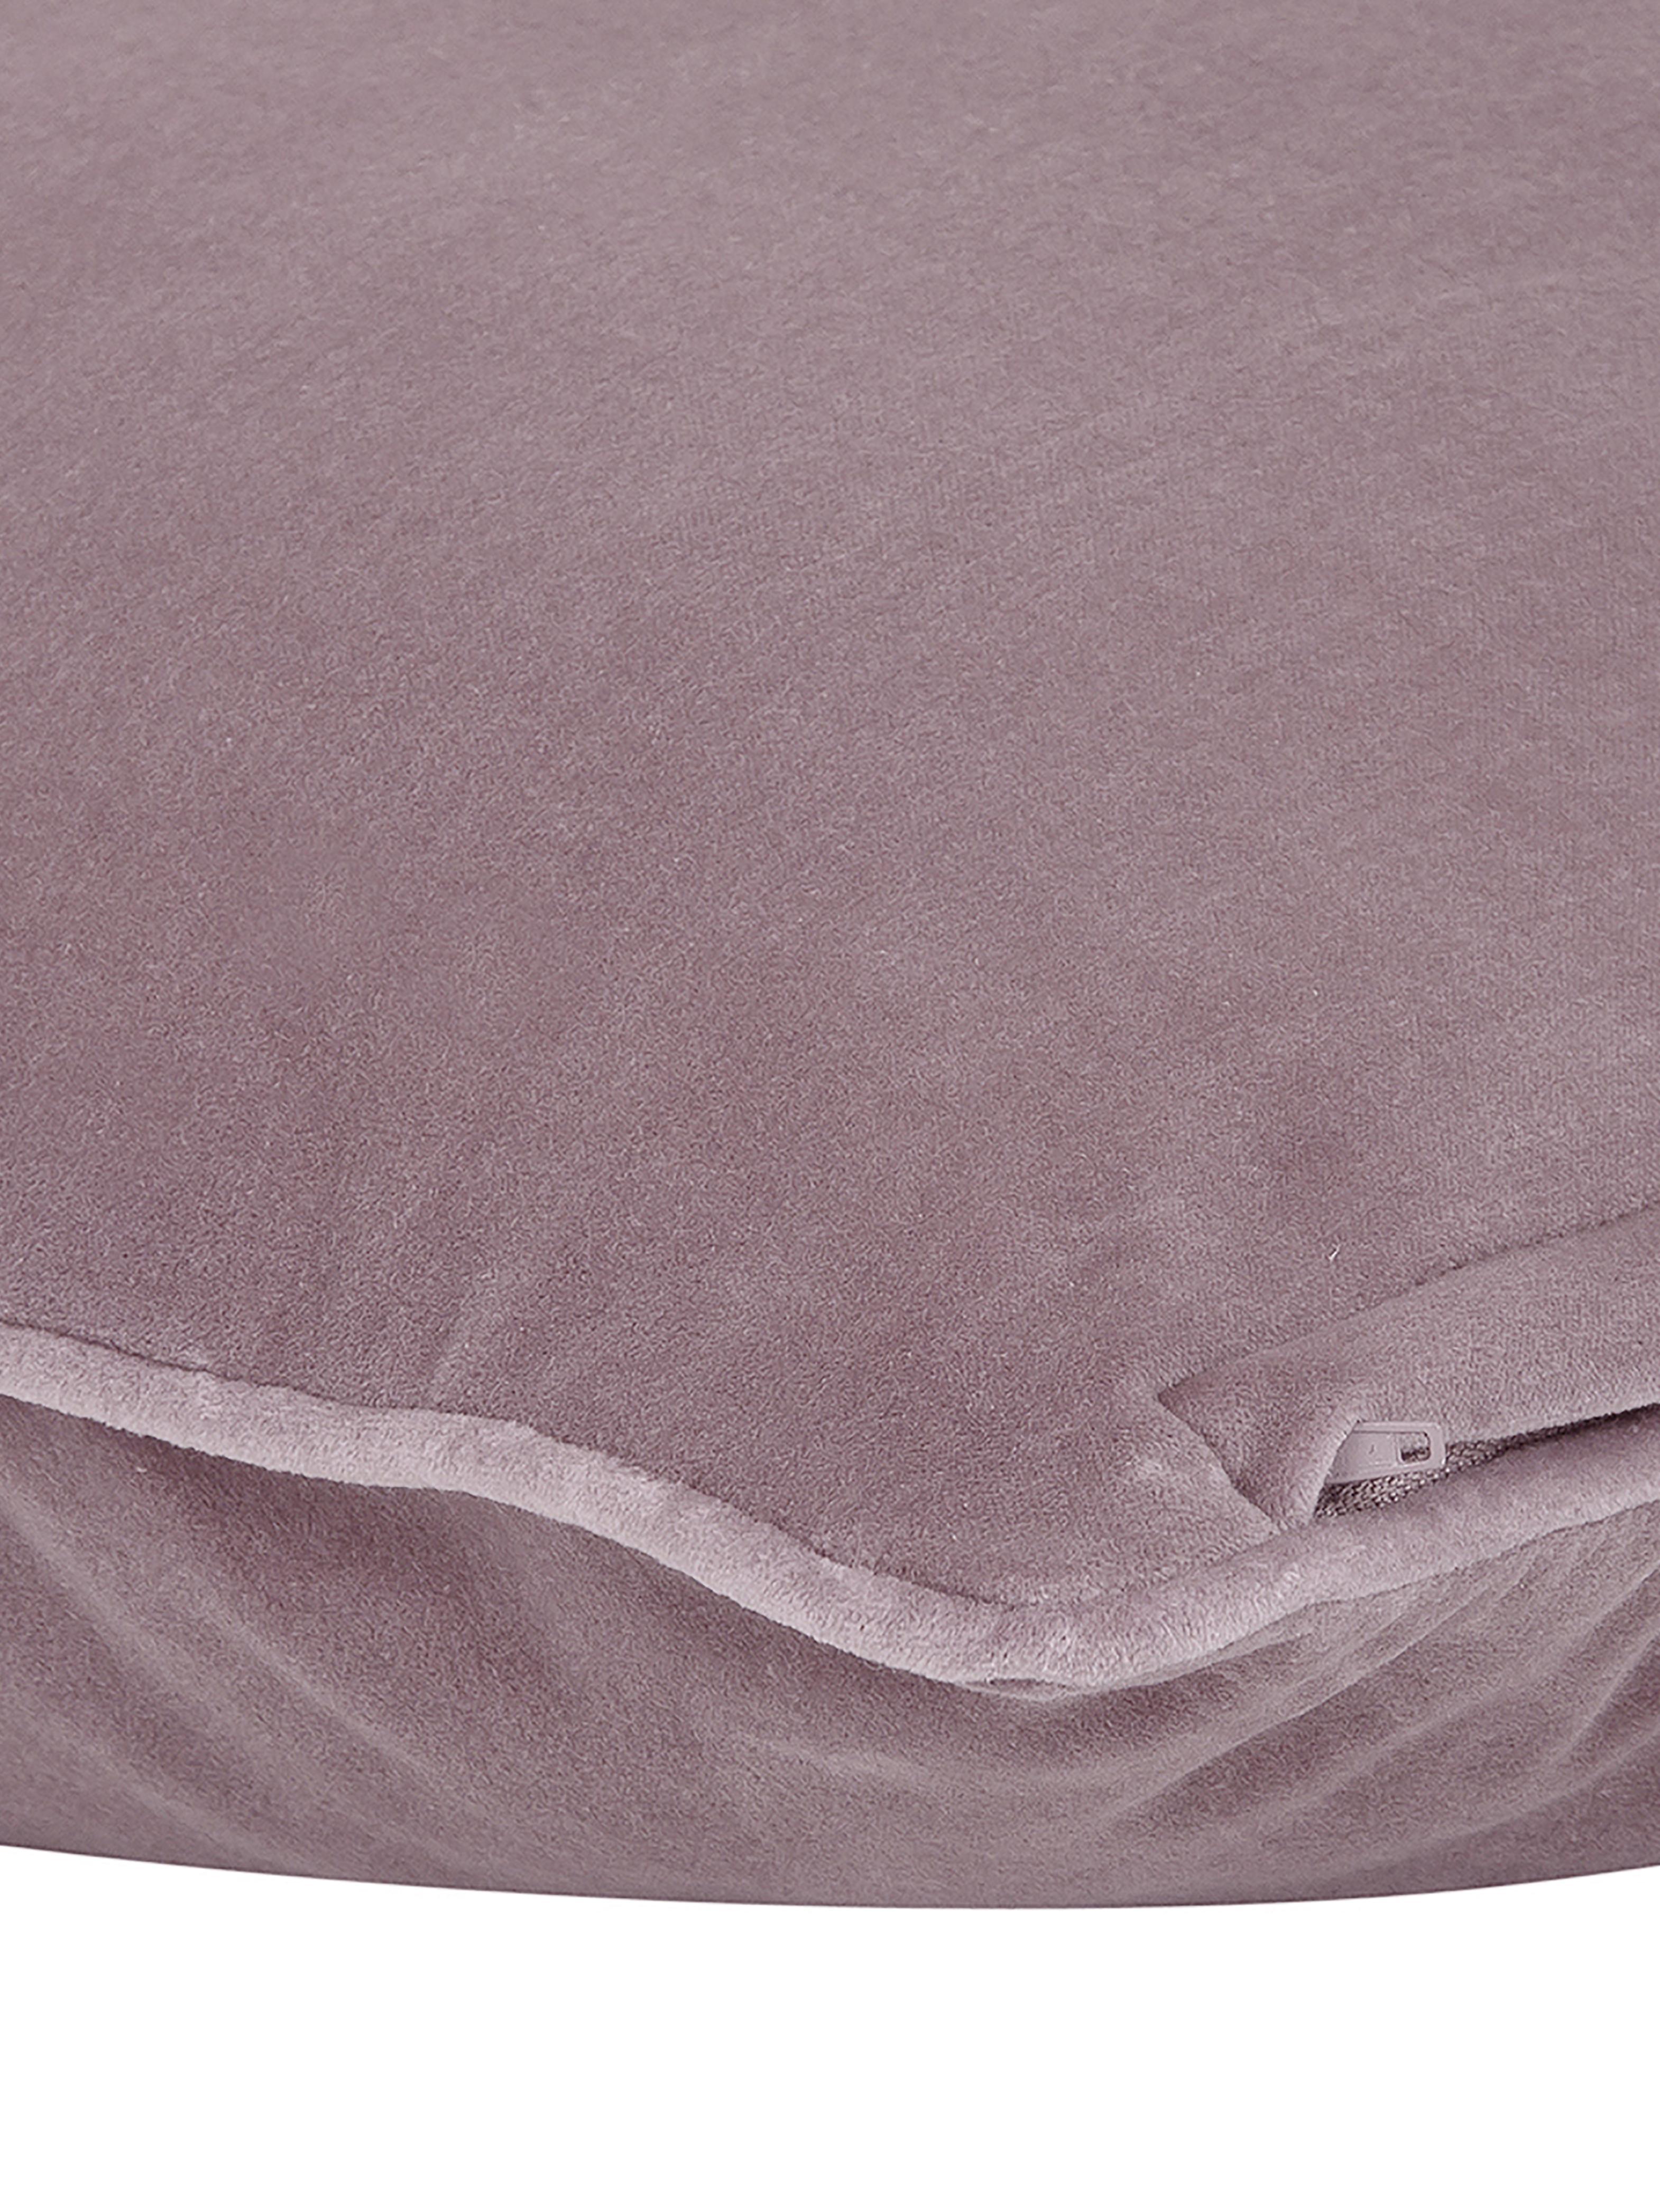 Einfarbige Samt-Kissenhülle Dana in Altrosa, 100% Baumwollsamt, Altrosa, 30 x 50 cm